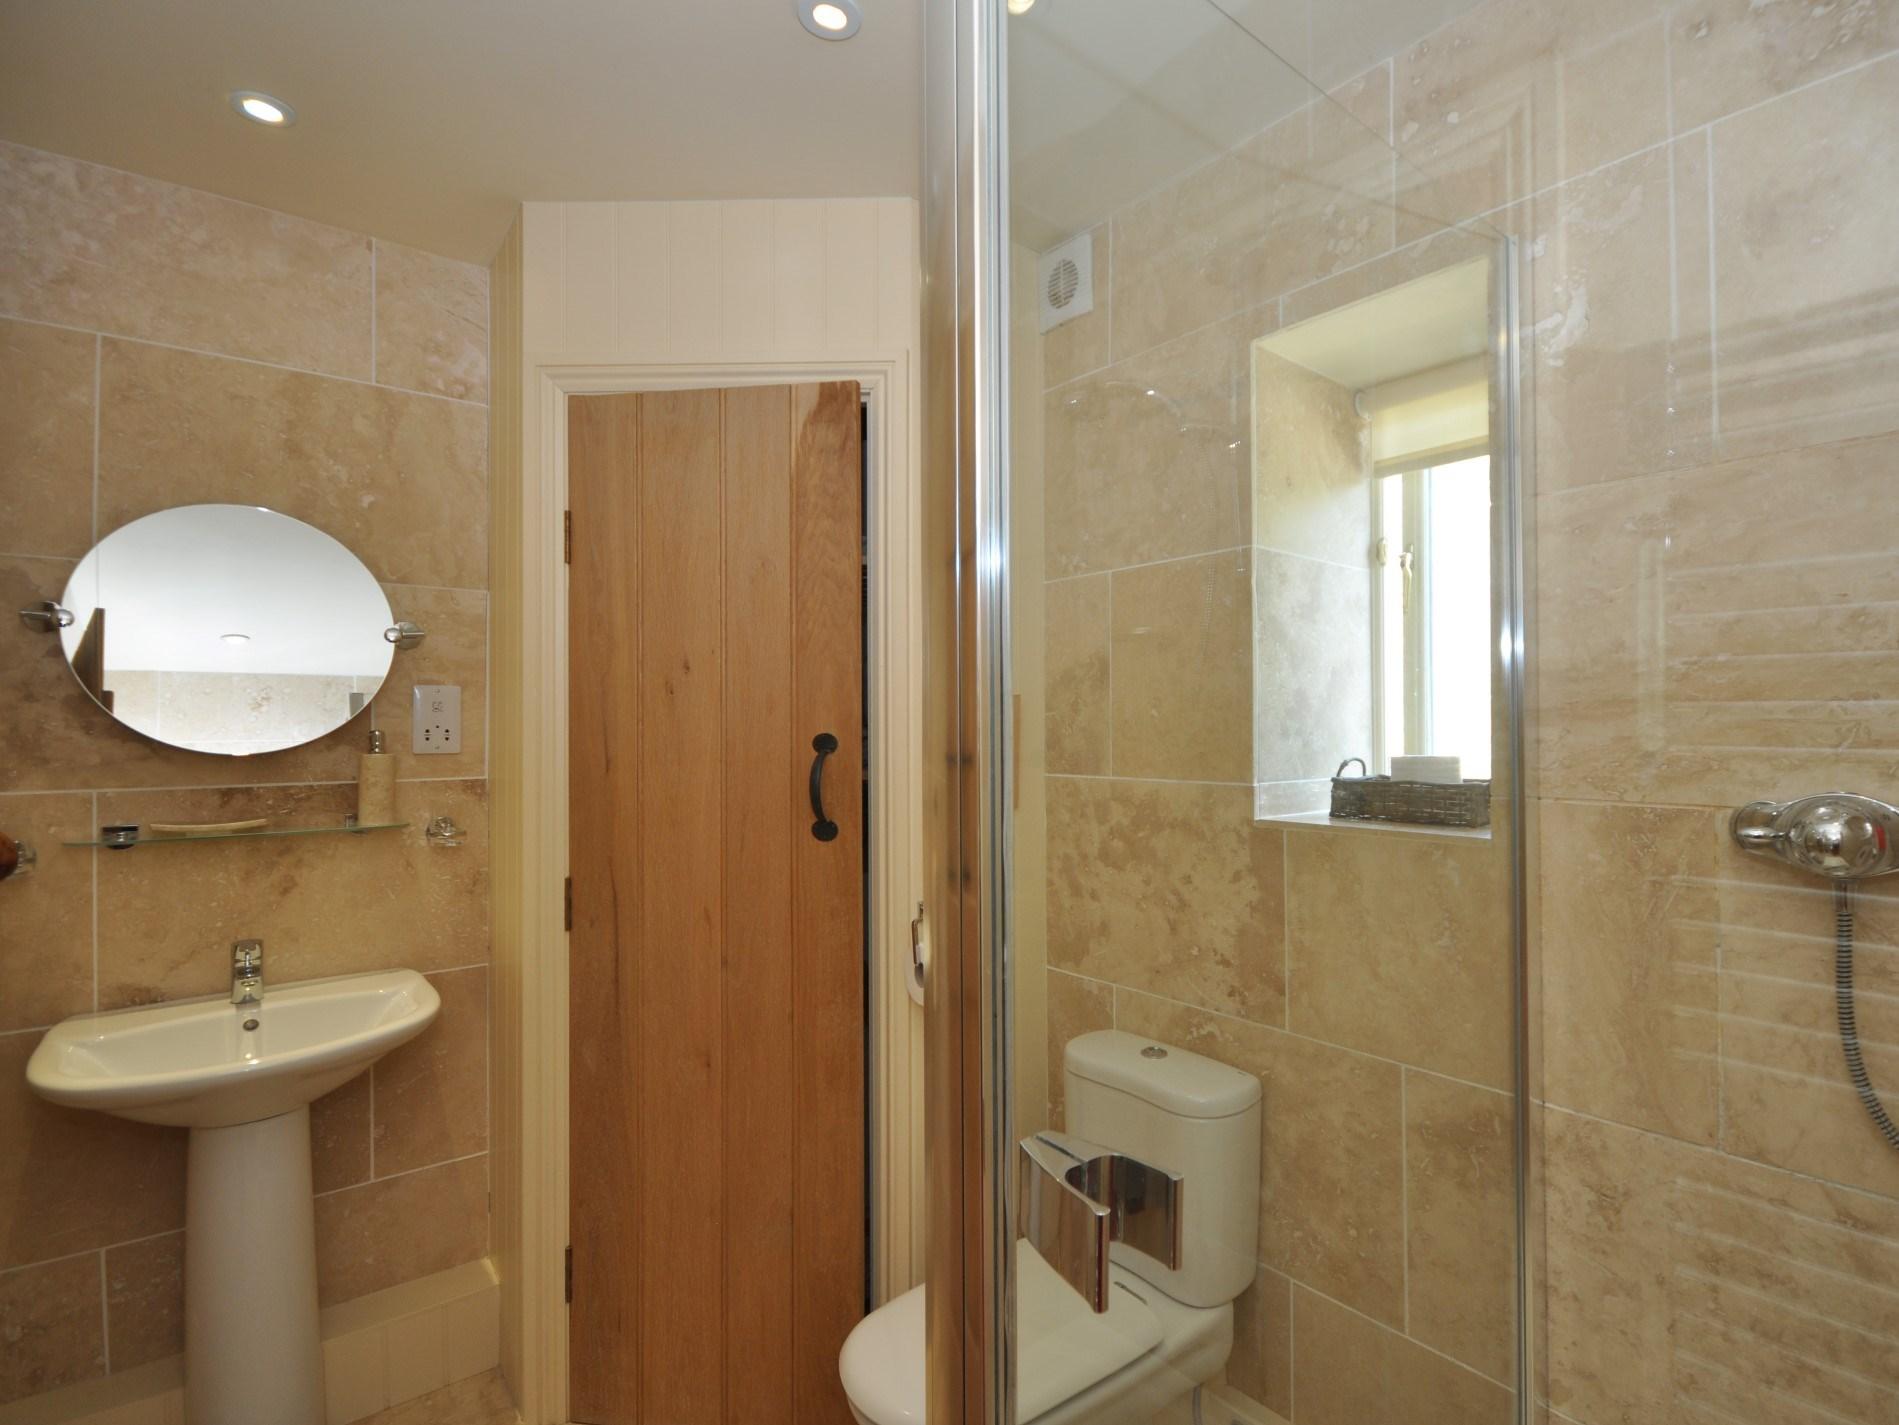 A ground floor shower room